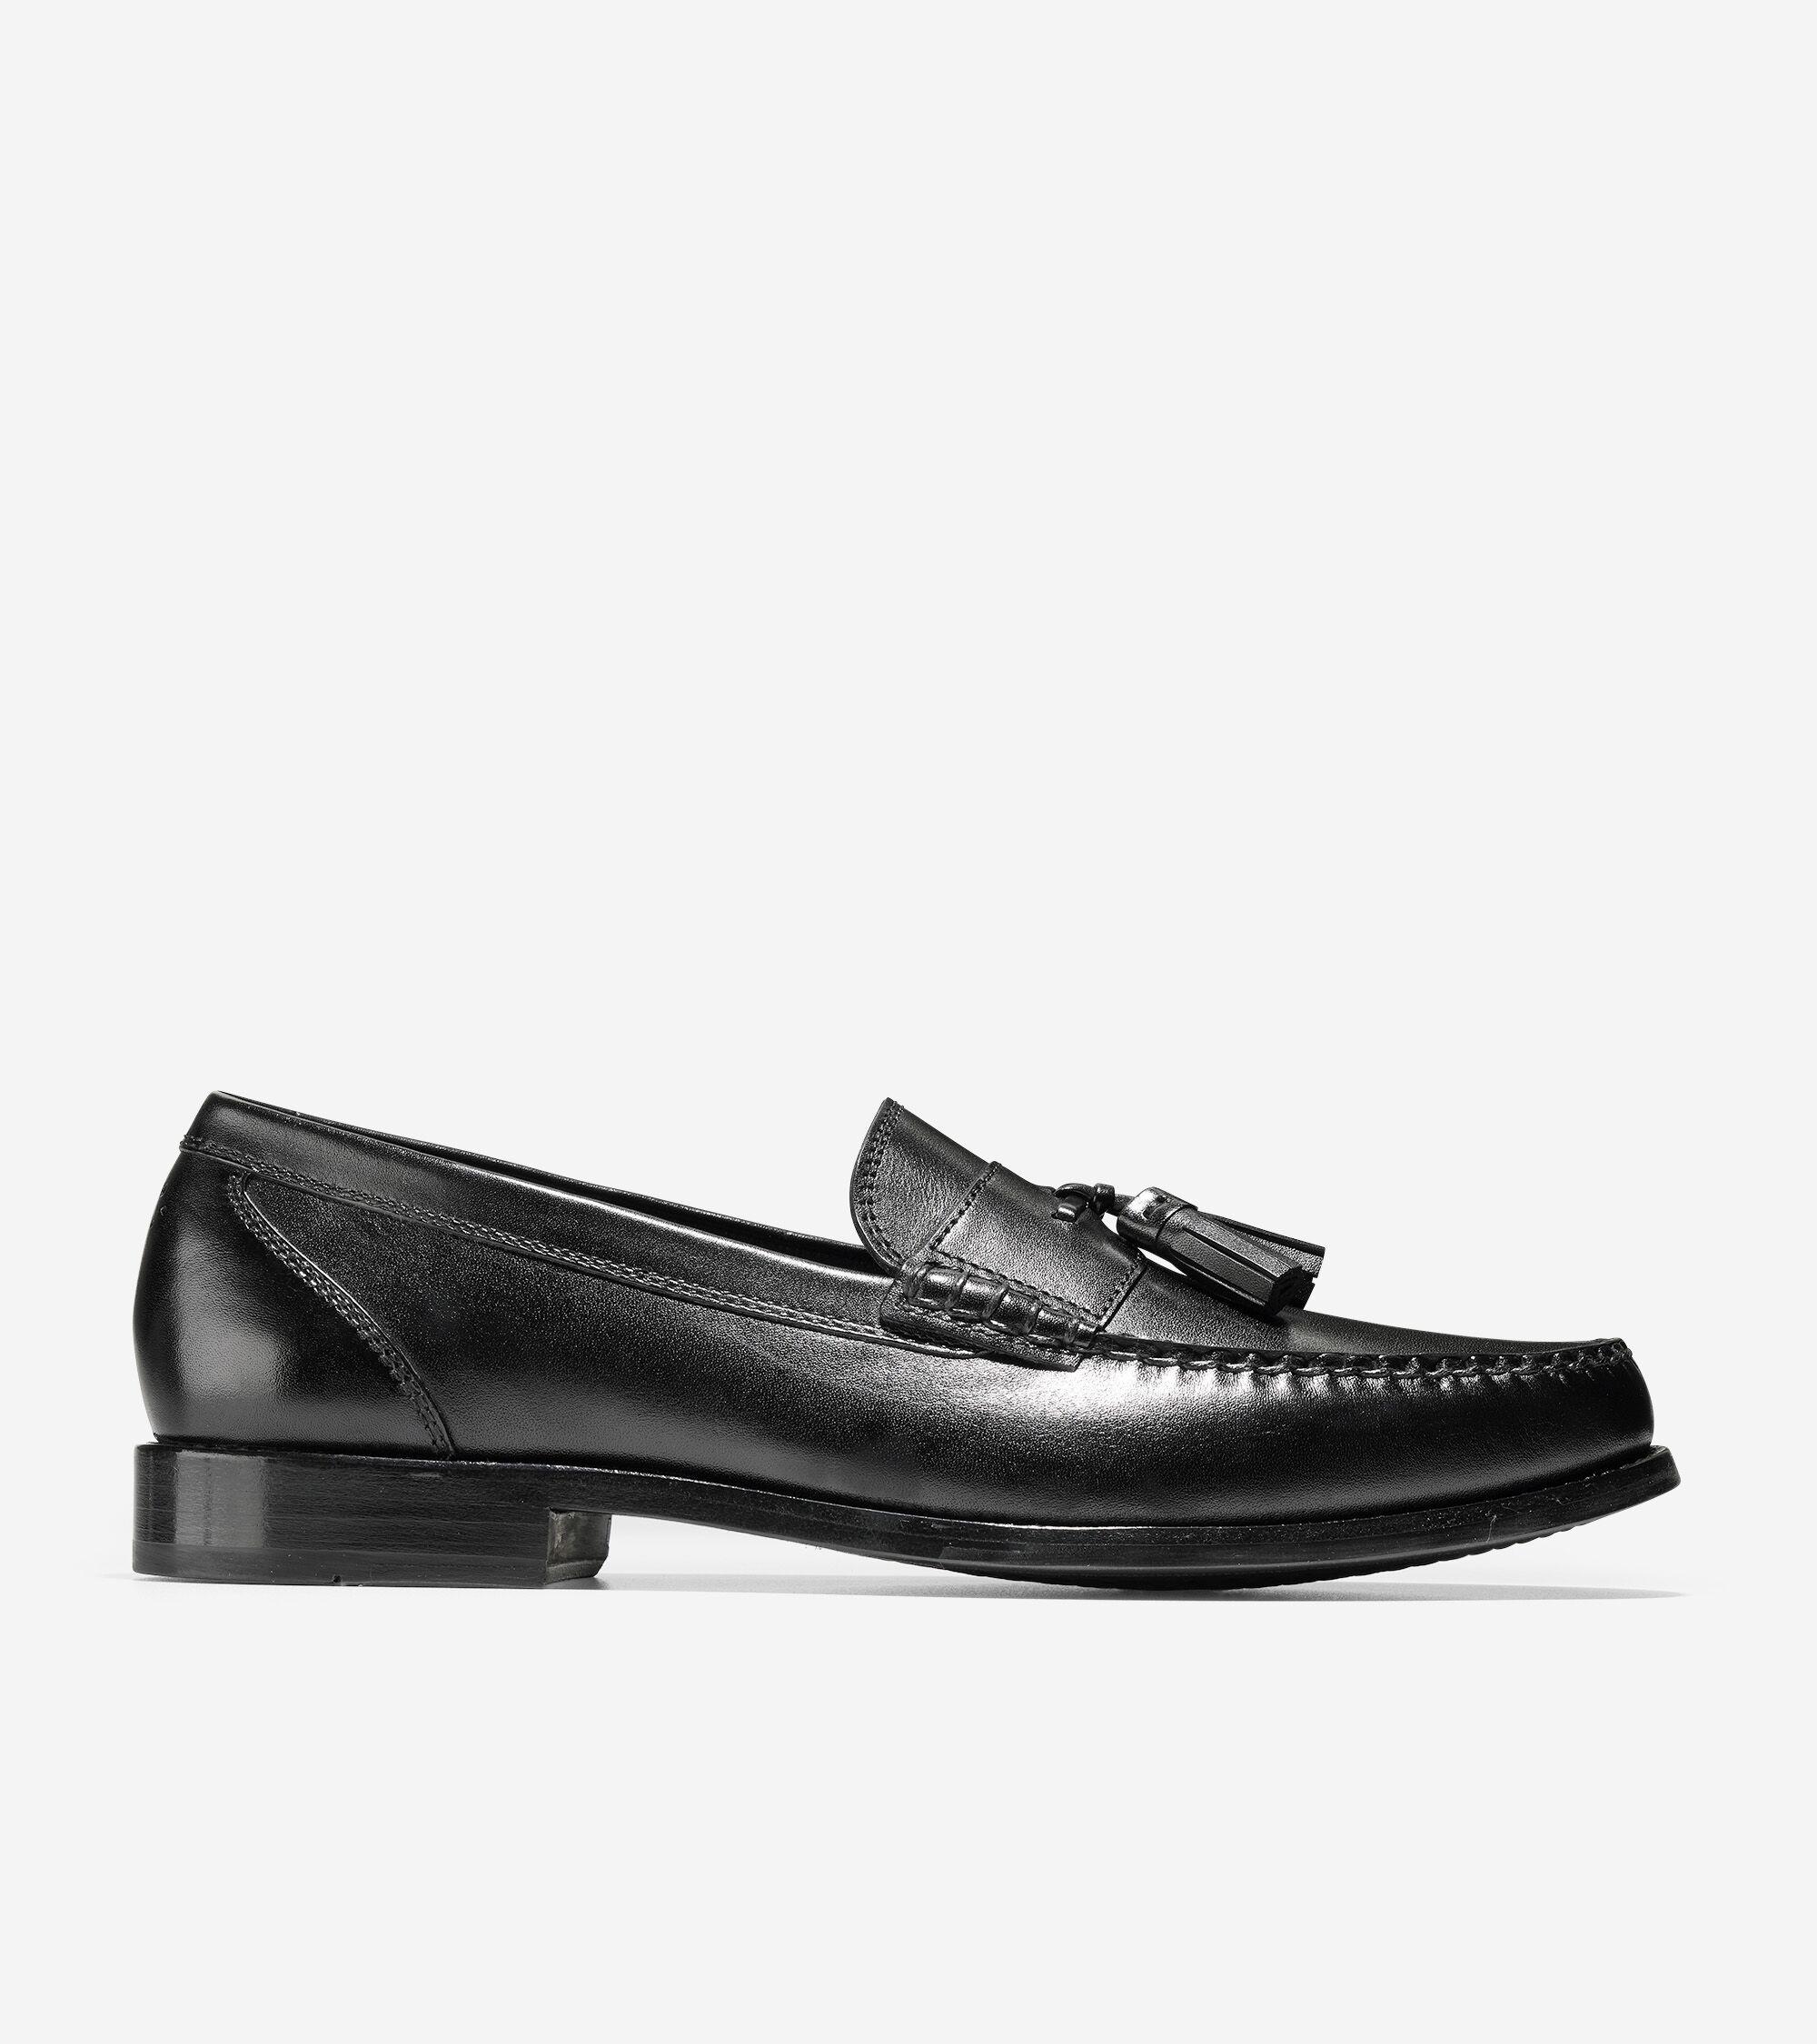 01f2c4d16b1 Men s Pinch Grand Classic Tassel Loafers in Black